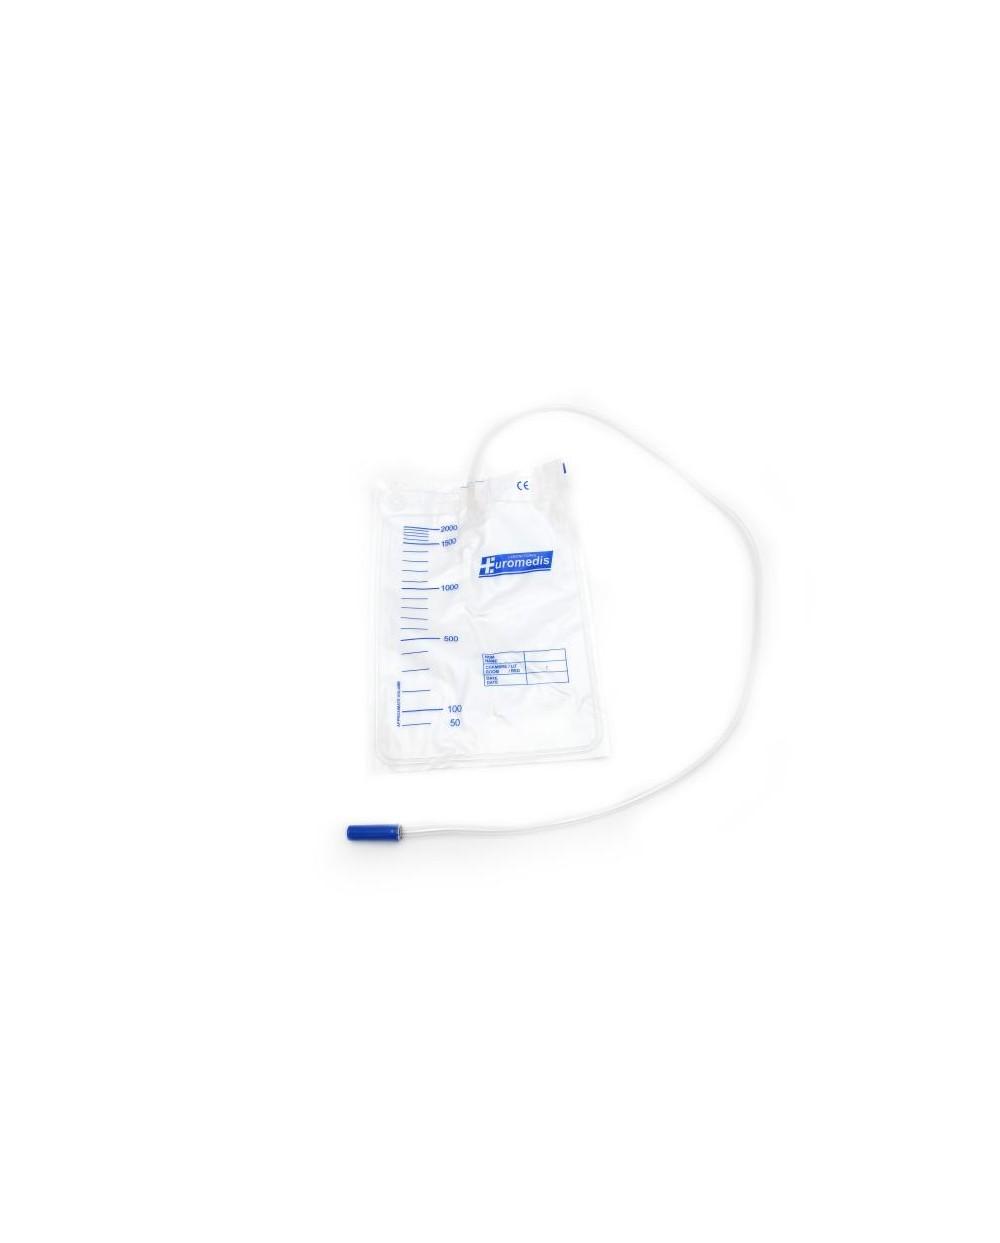 Sac à urine, 2 litres, gradué, avec valve anti-reflux, tube 90 cm.